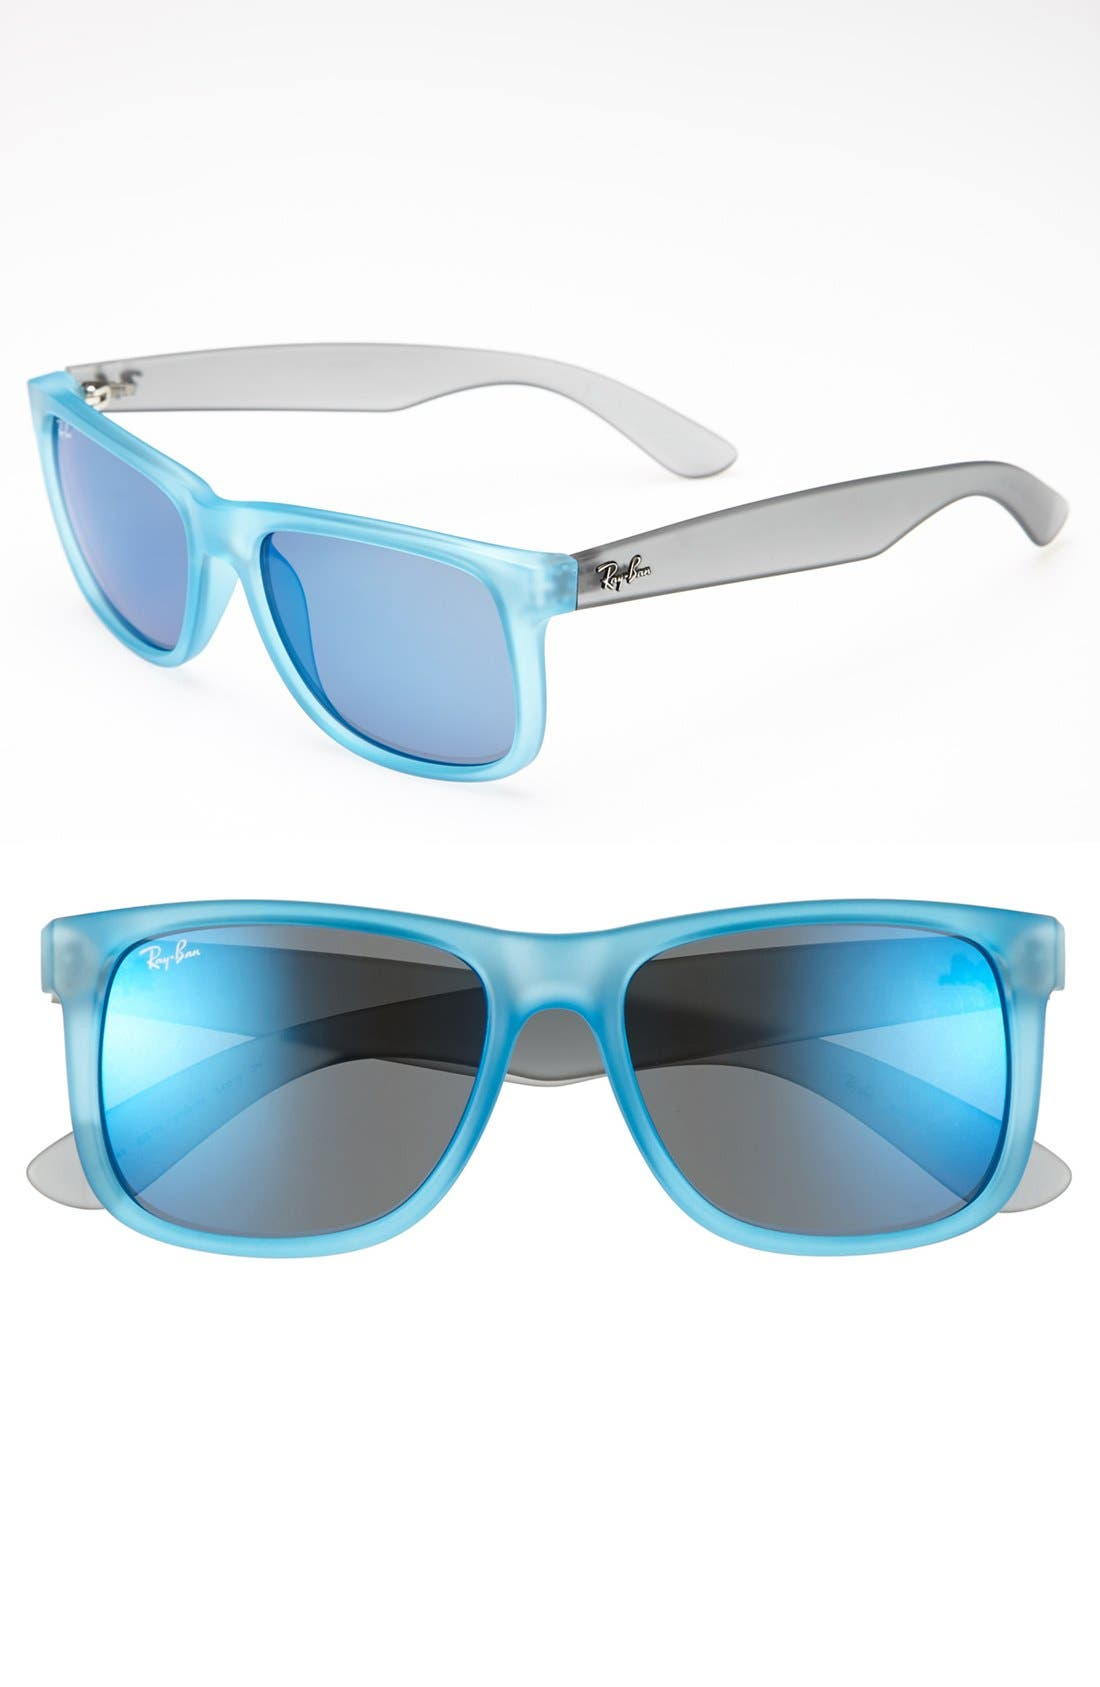 Main Image - Ray-Ban 'Youngster - Justin' 54mm Sunglasses